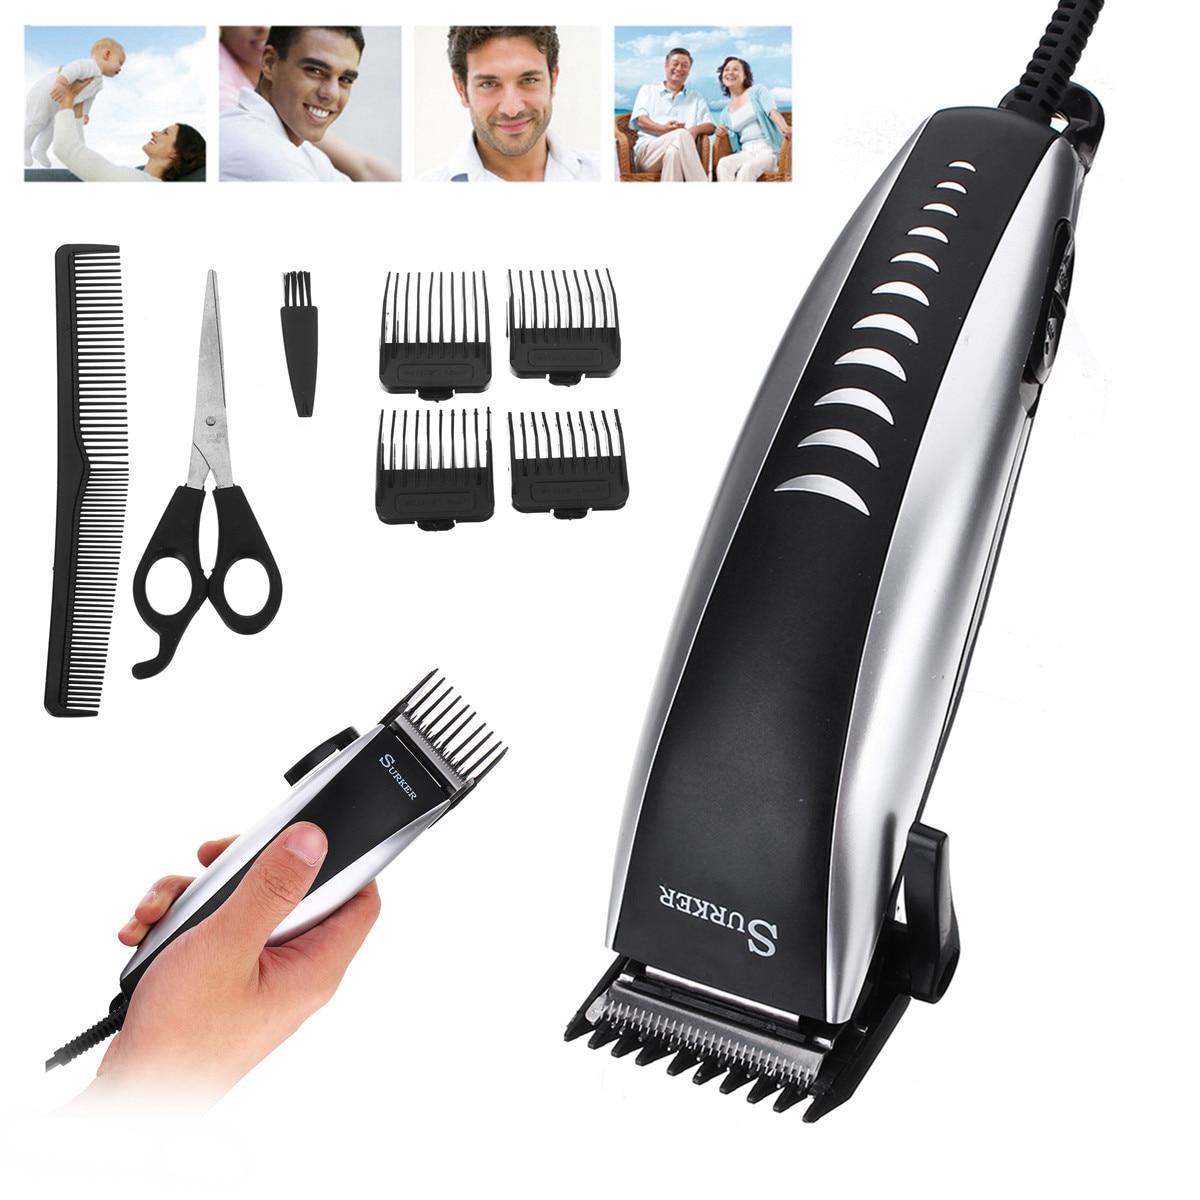 220-240V 50Hz 12W Professional Men Electric Hair Trimmer Clipper Cutting Kids Man Adult Anti Slip Set Scissor EU Plug Adjustable